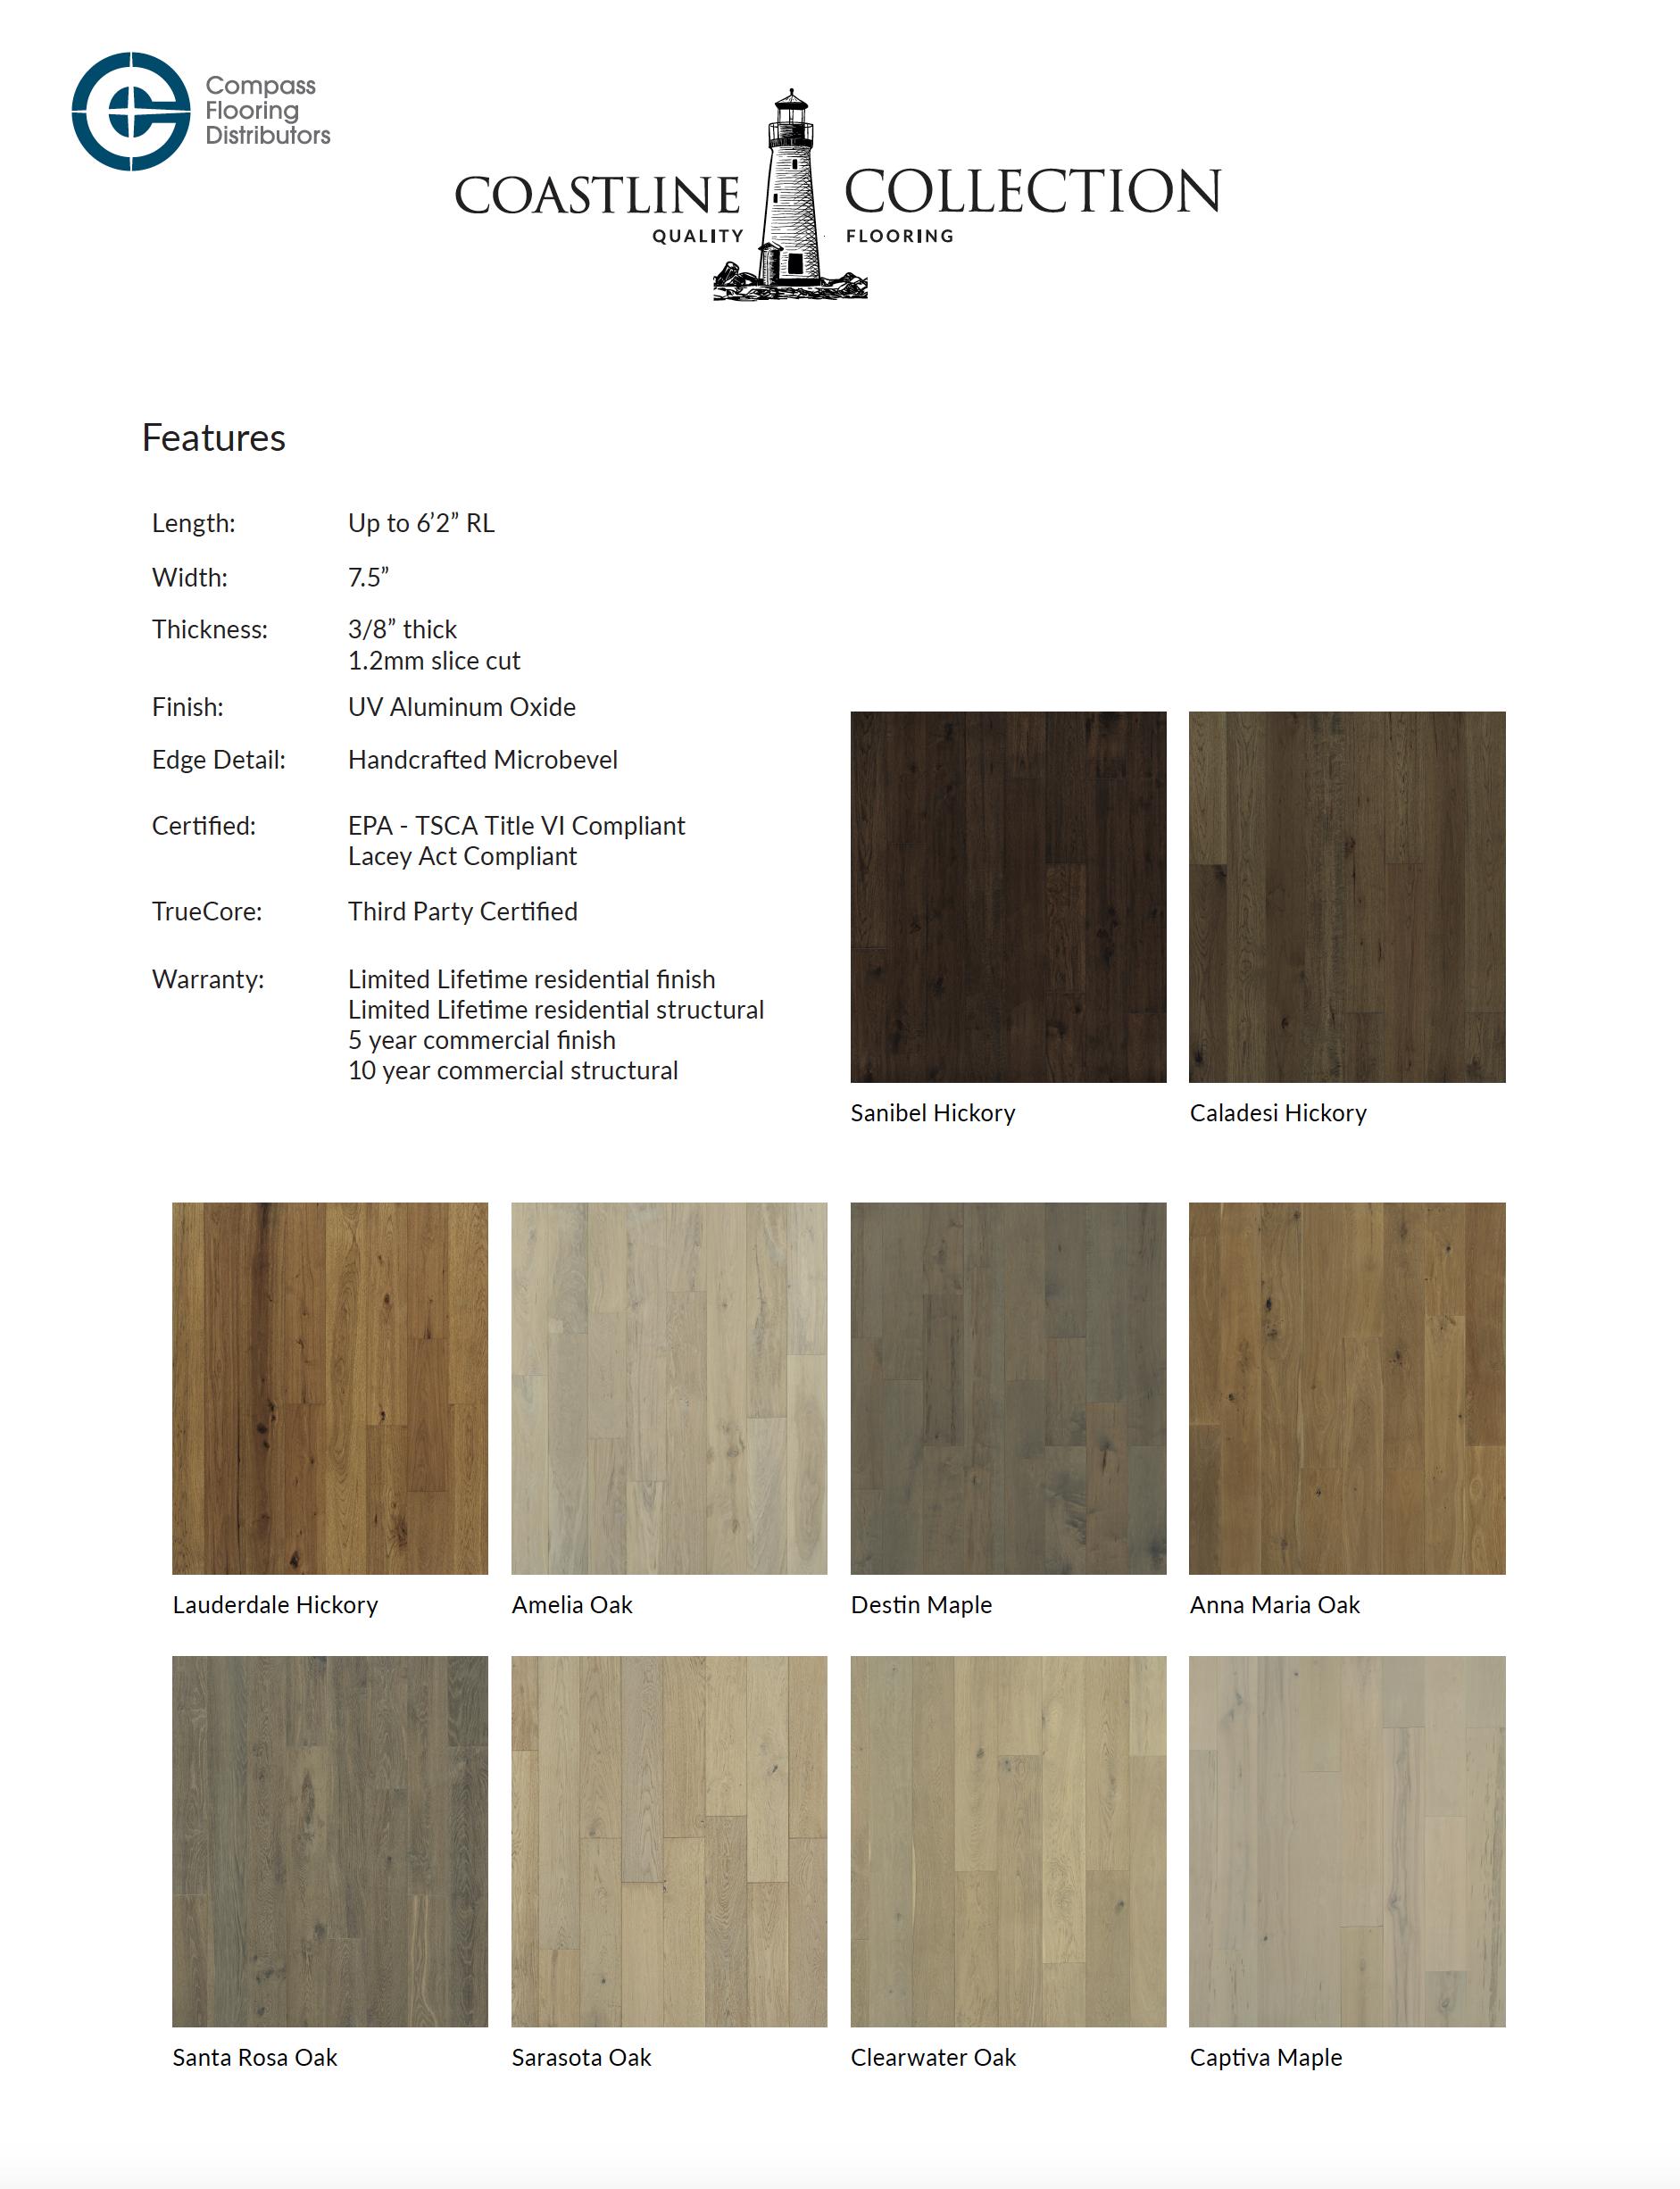 Coastline Specification sheet for Compass Flooring